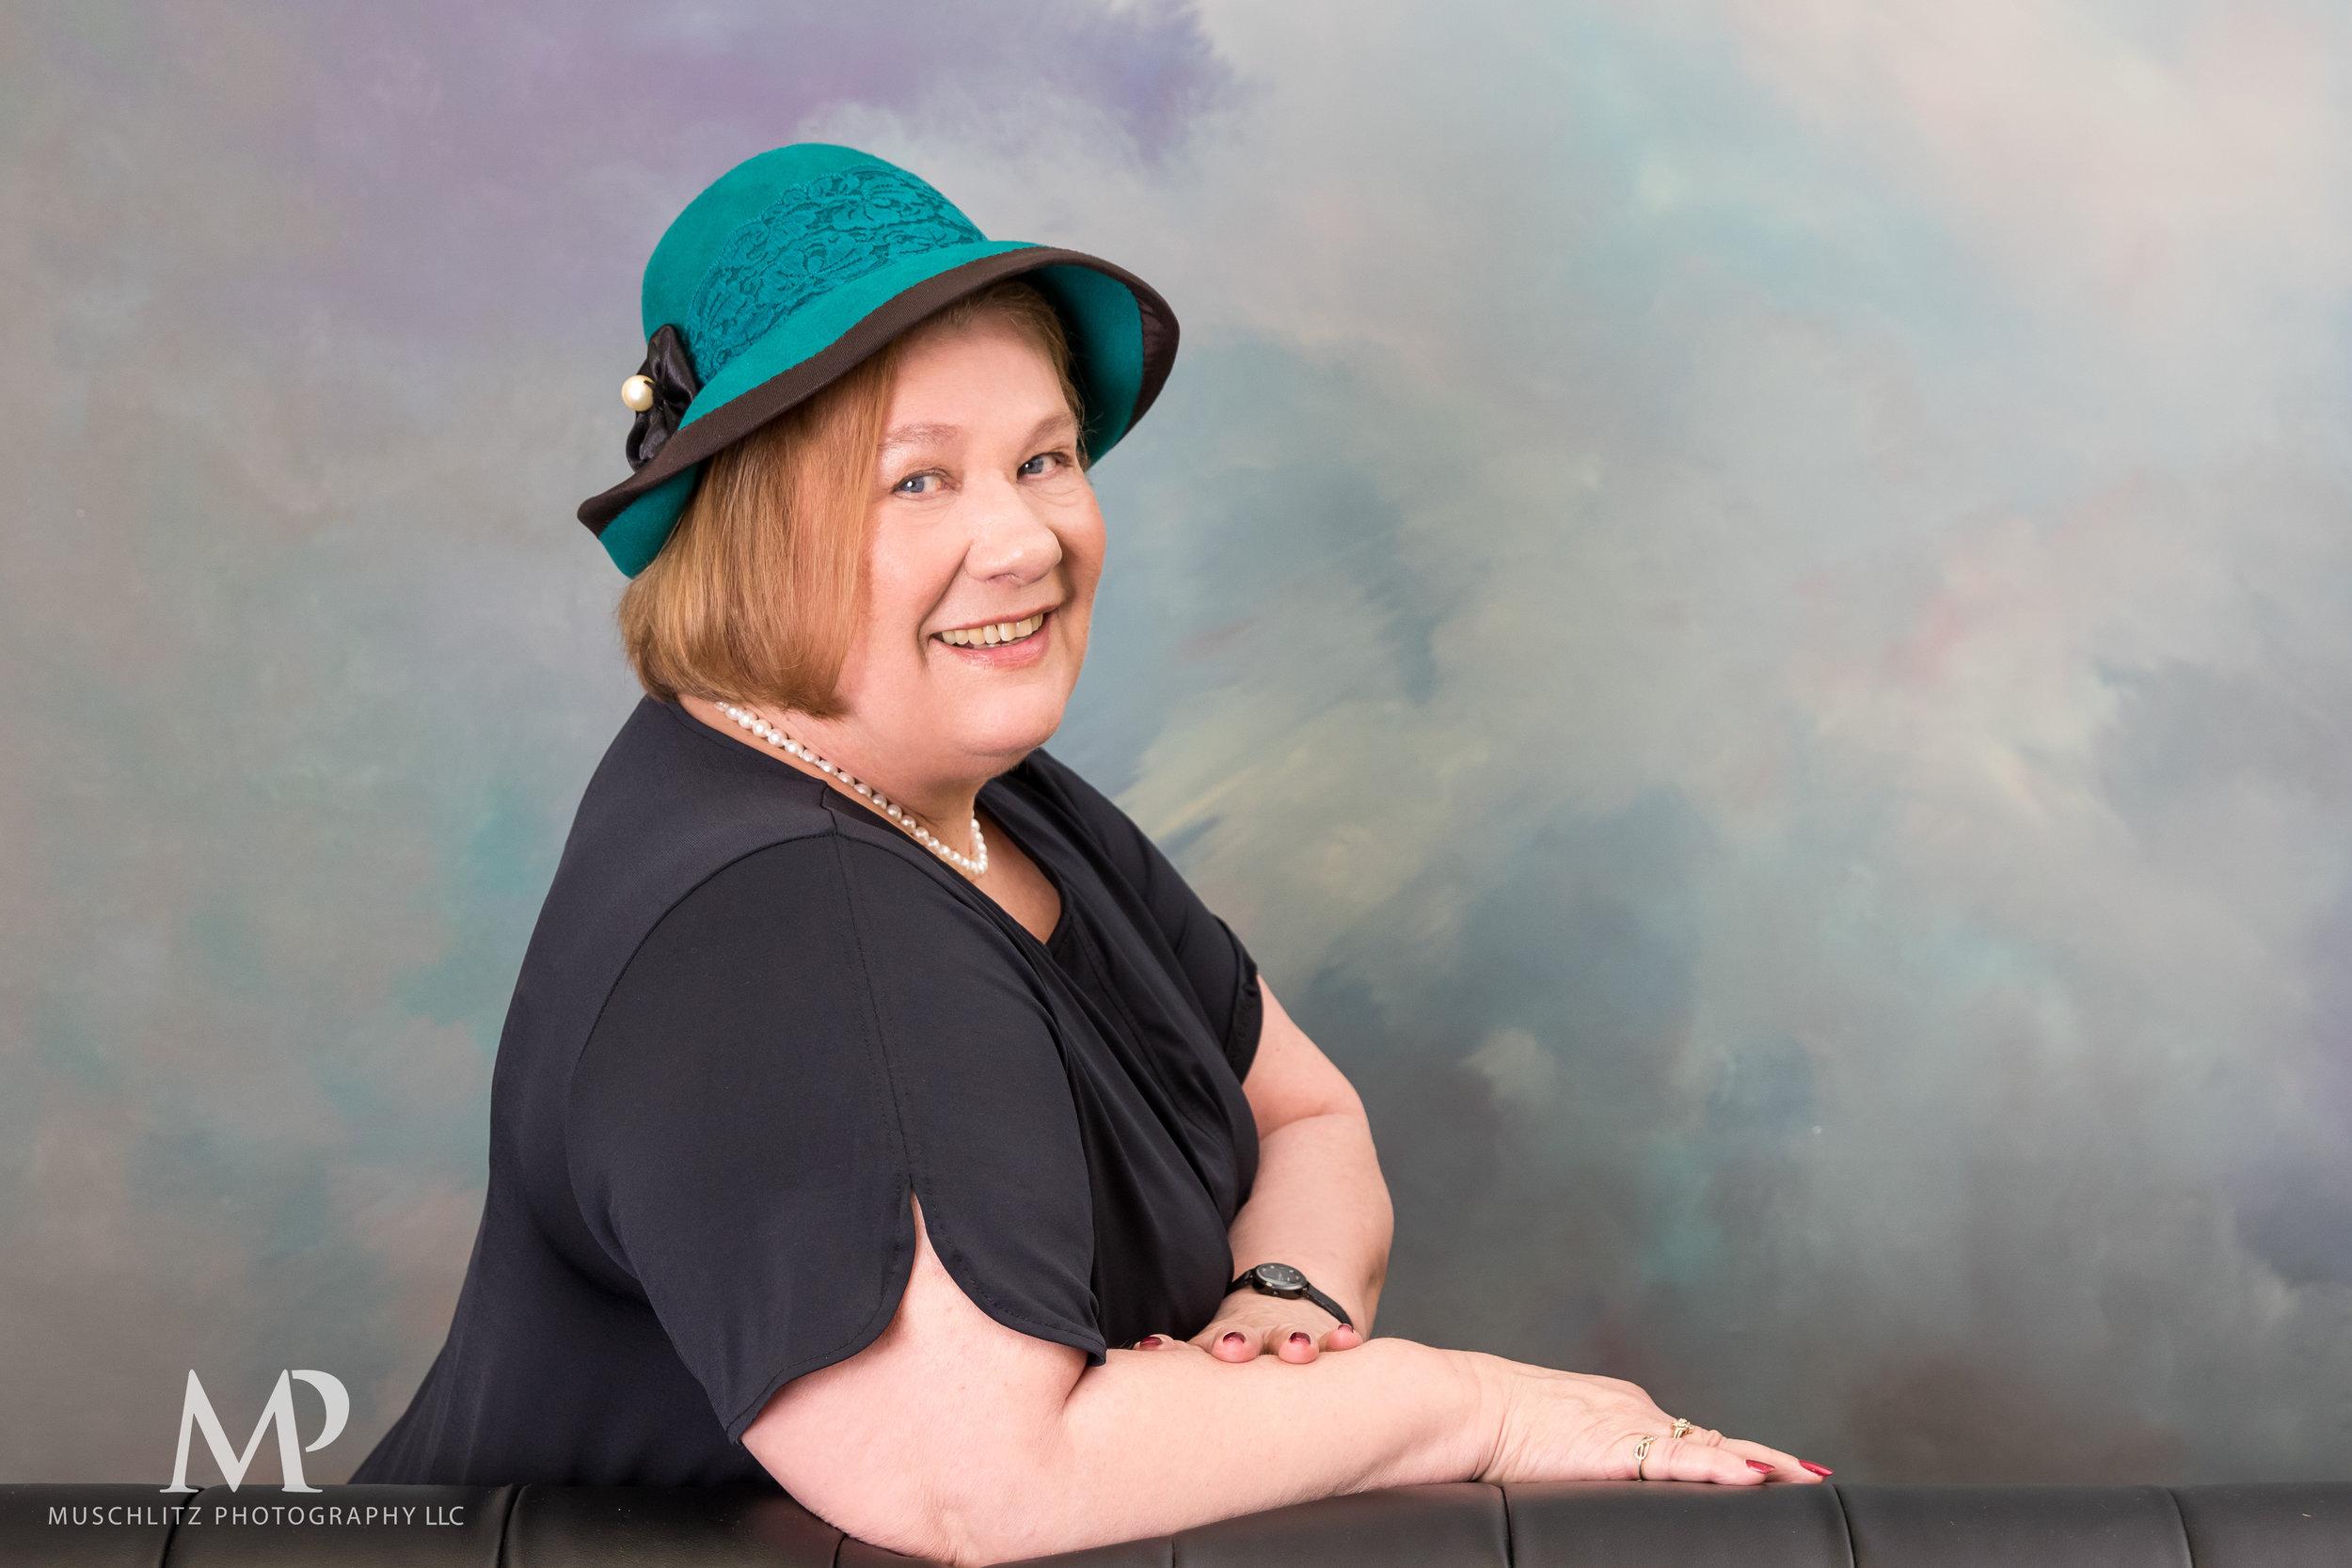 beauty-glamour-65-birthday-portrait-session-portraits-columbus-ohio-muschlitz-photography-038.JPG